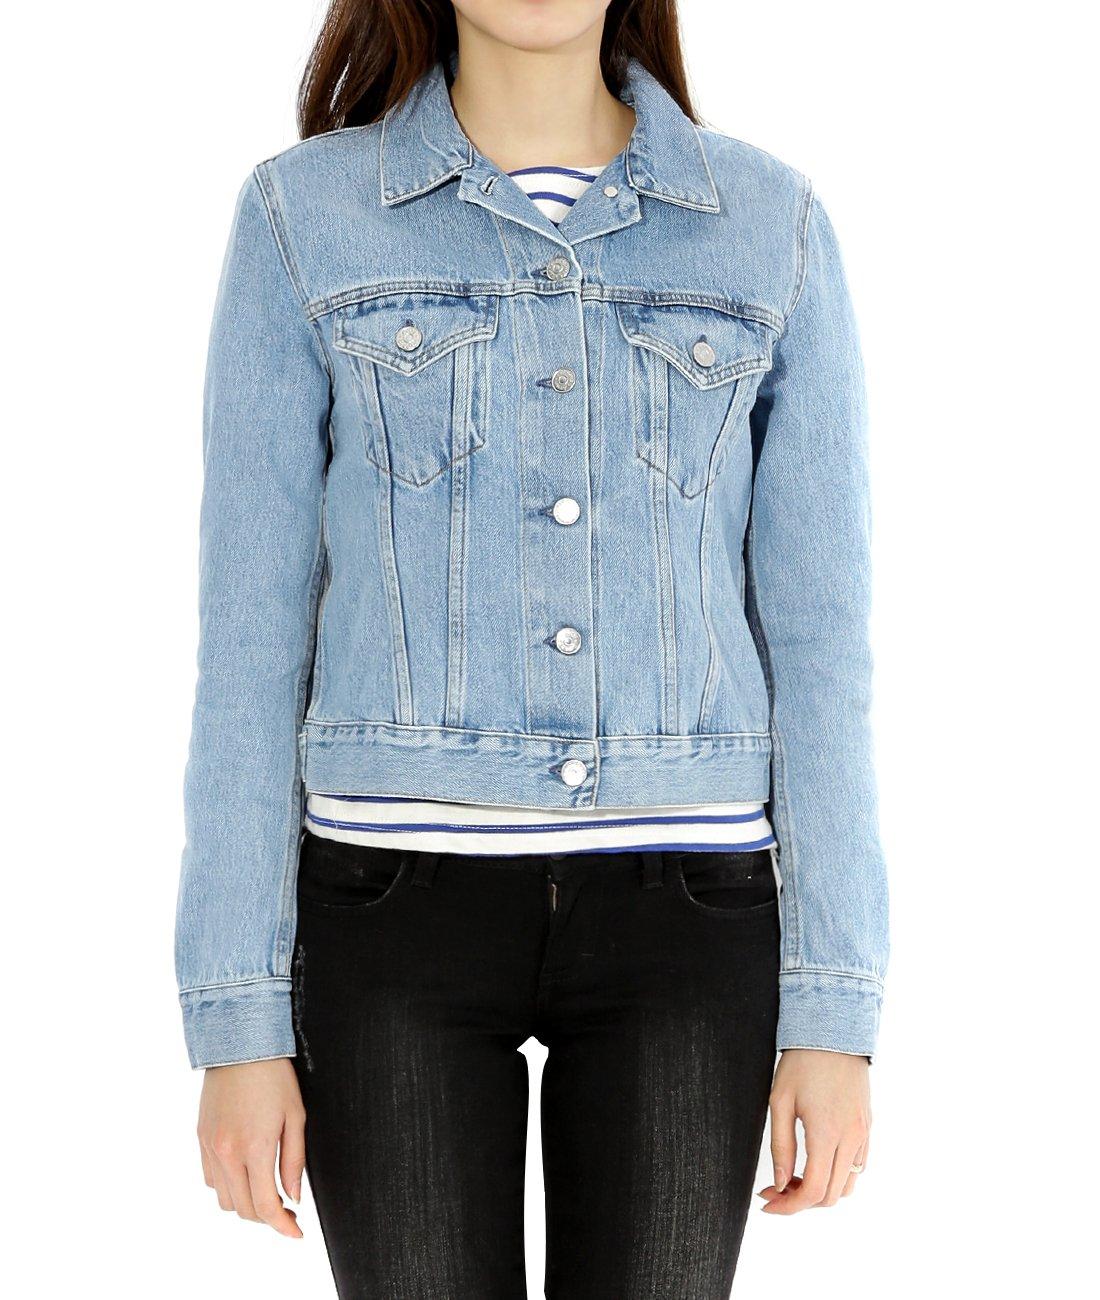 Wiberlux Acne Top Mid Vtg Women's Short Vintage Denim Jacket 34 Blue